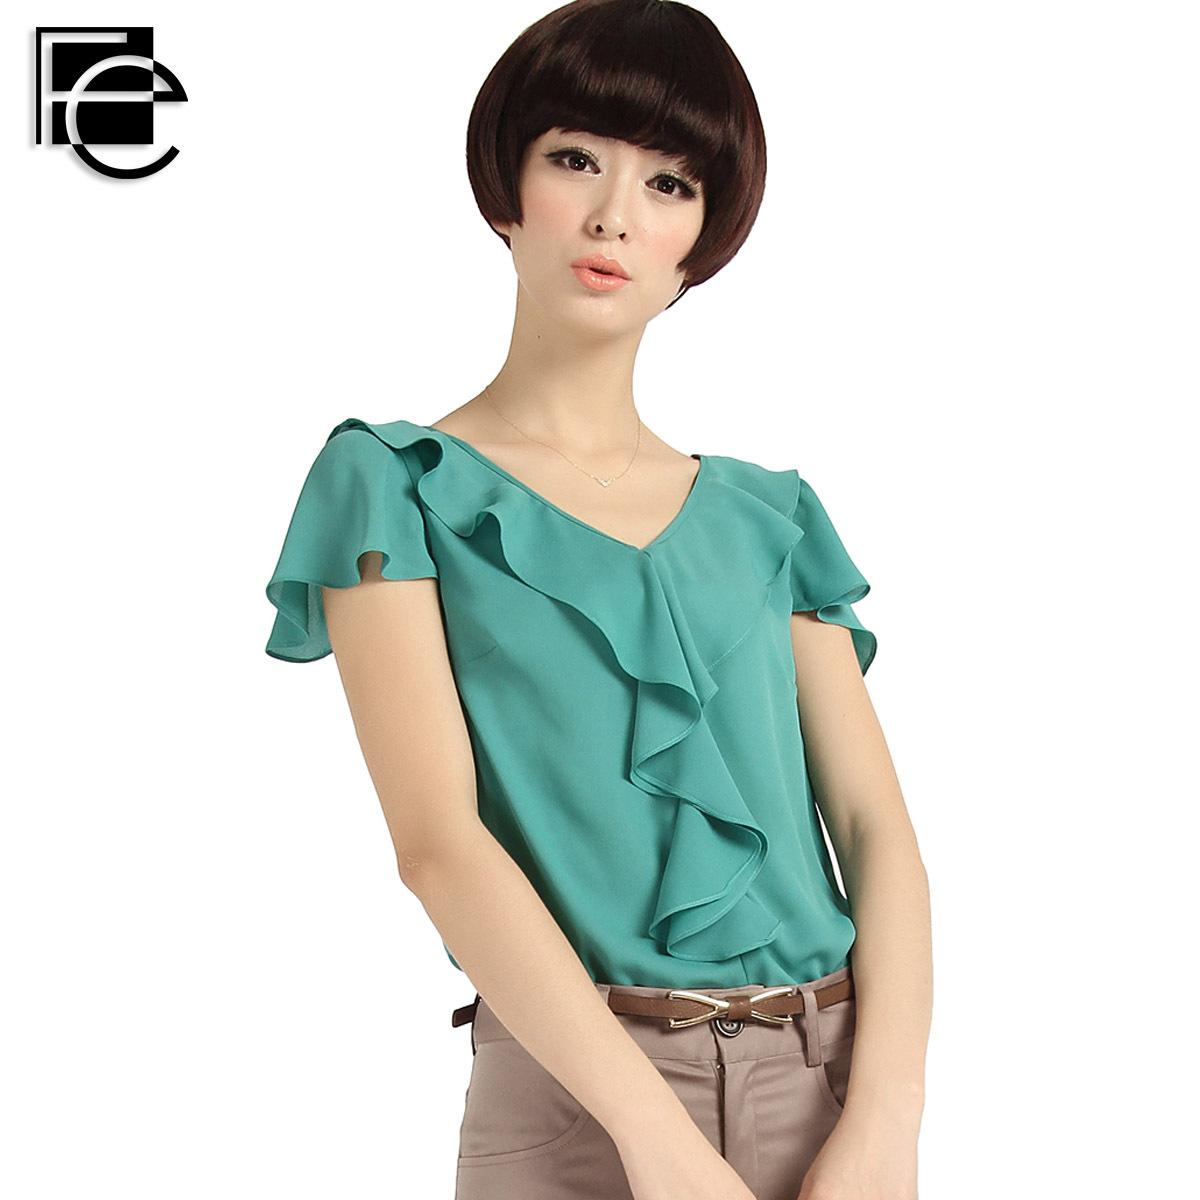 12a090a822df76 Buy Chiffon shirt top summer short-sleeve women t-shirt ruffle V-neck  short-sleeve chiffon shirt fbl0050 in Cheap Price on m.alibaba.com